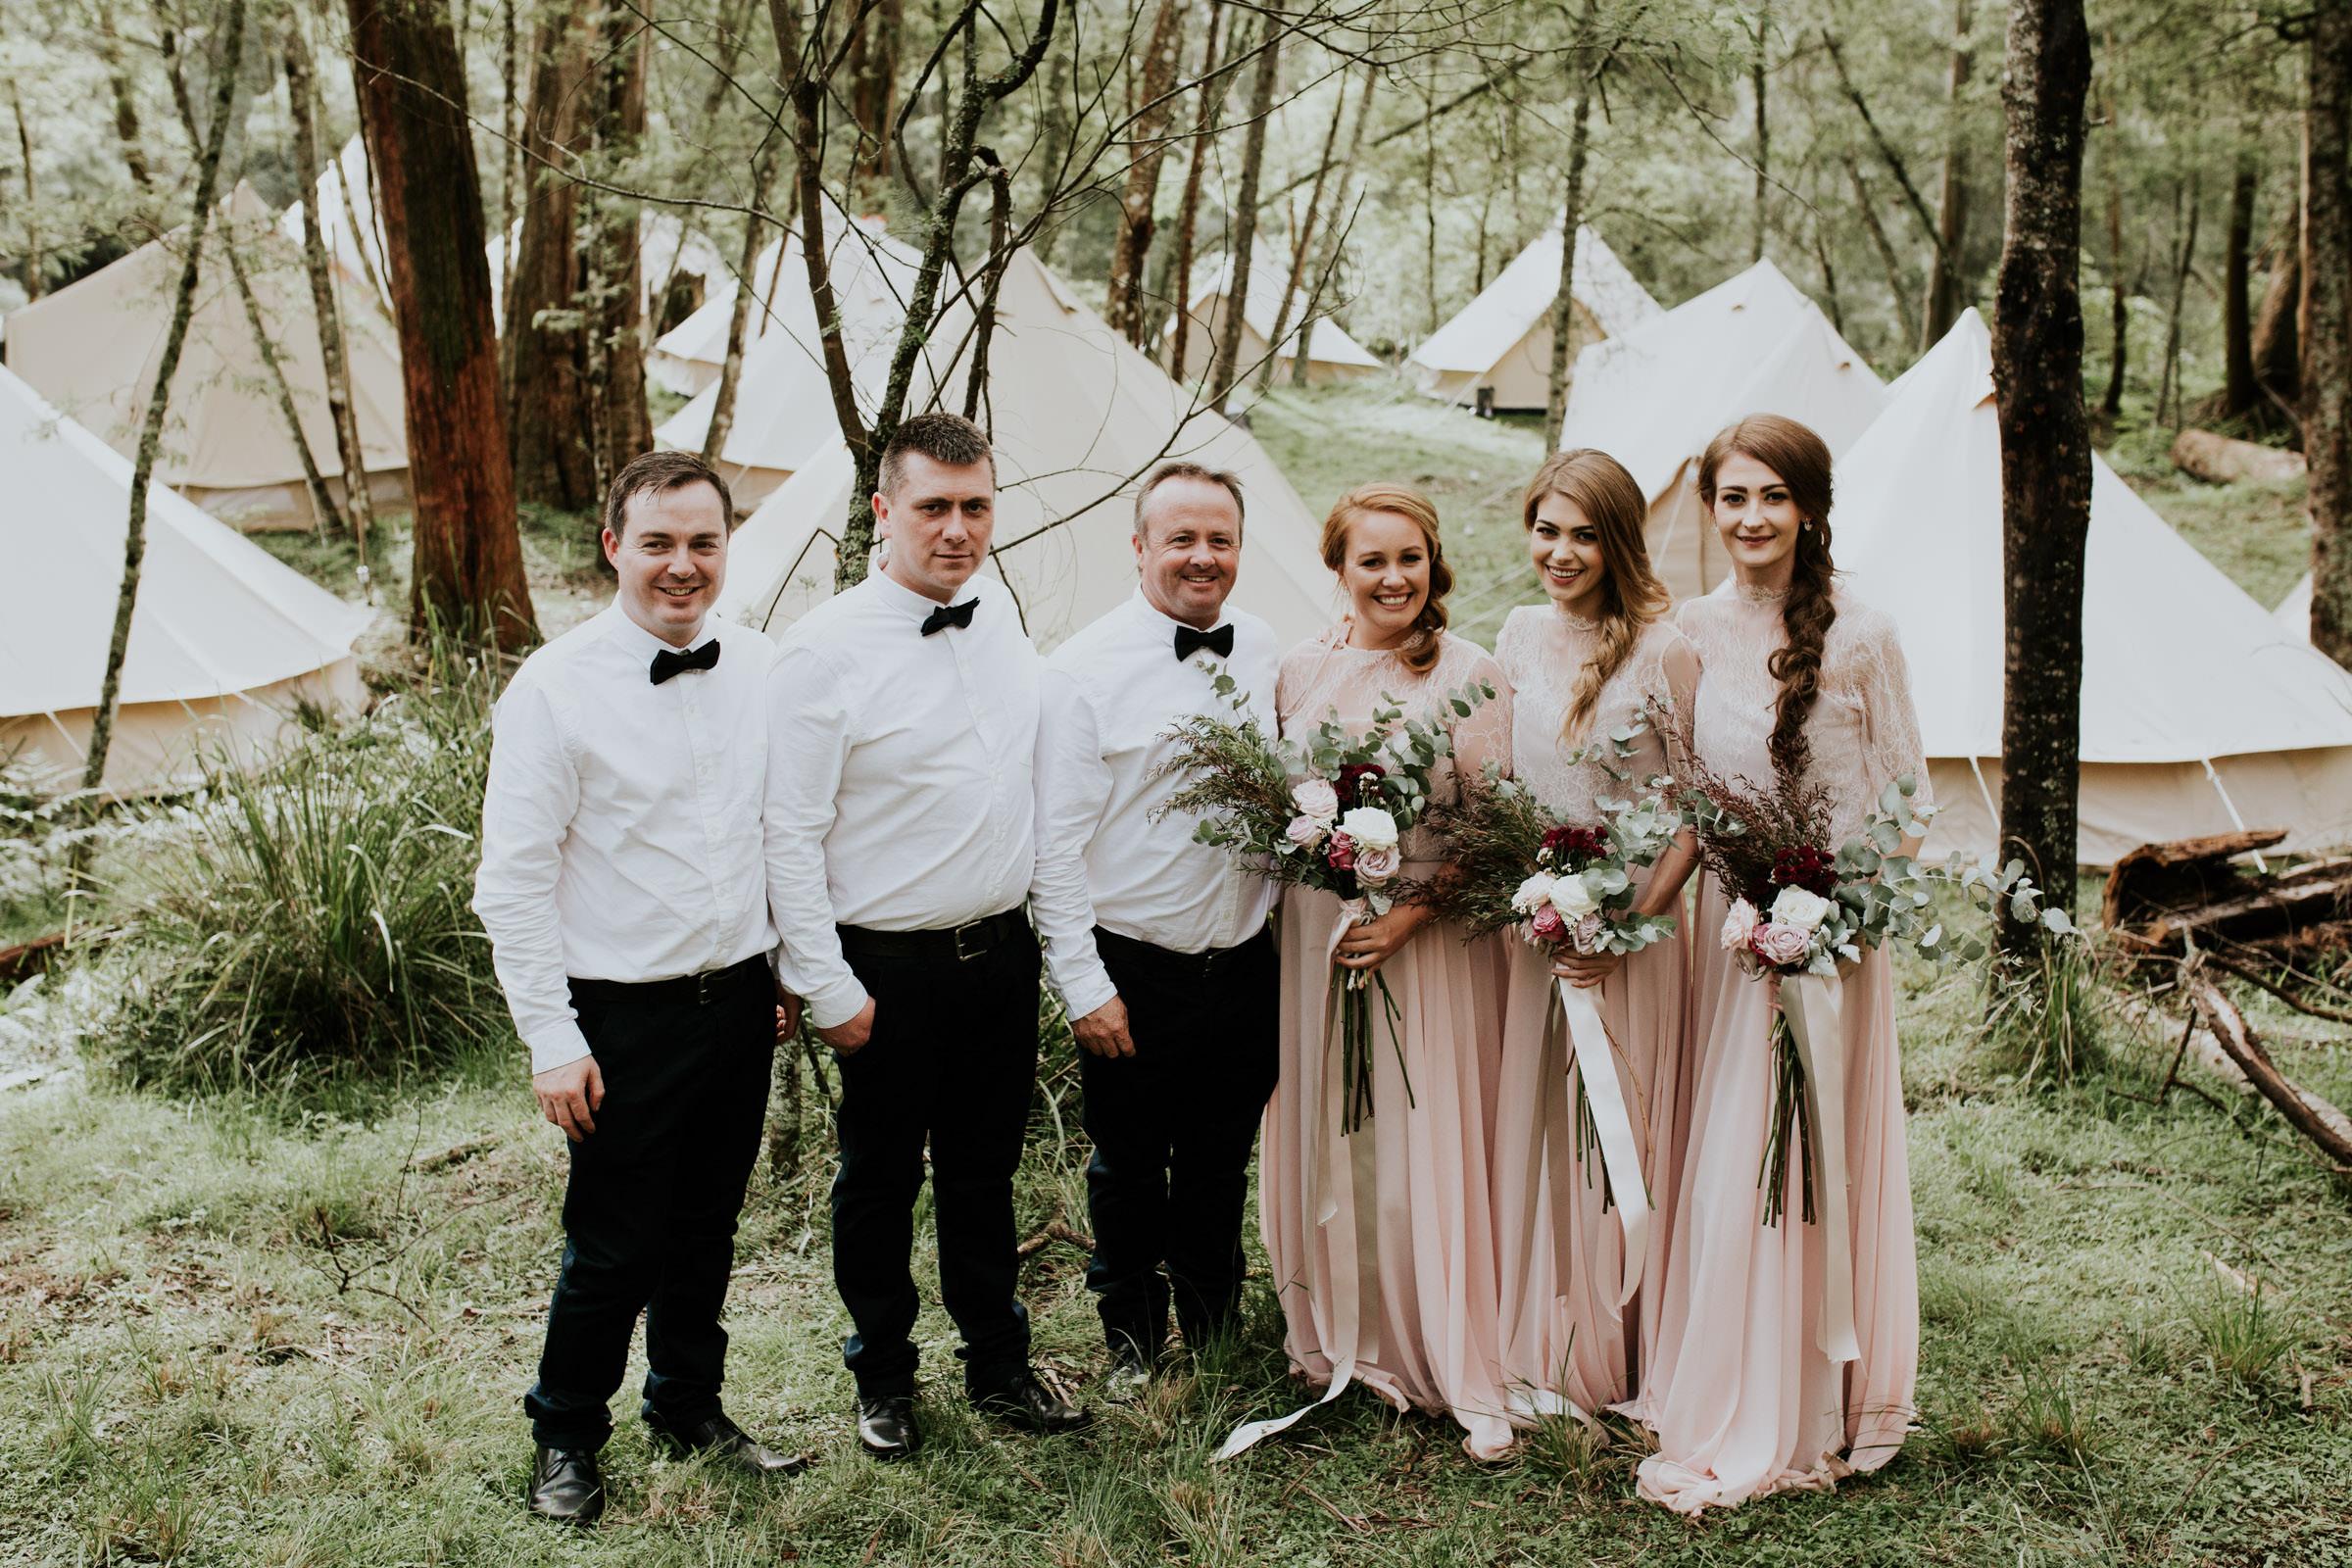 Emma+John+Far+South+Coast+Wedding+Festivl+Glamping+Bush-132.jpg